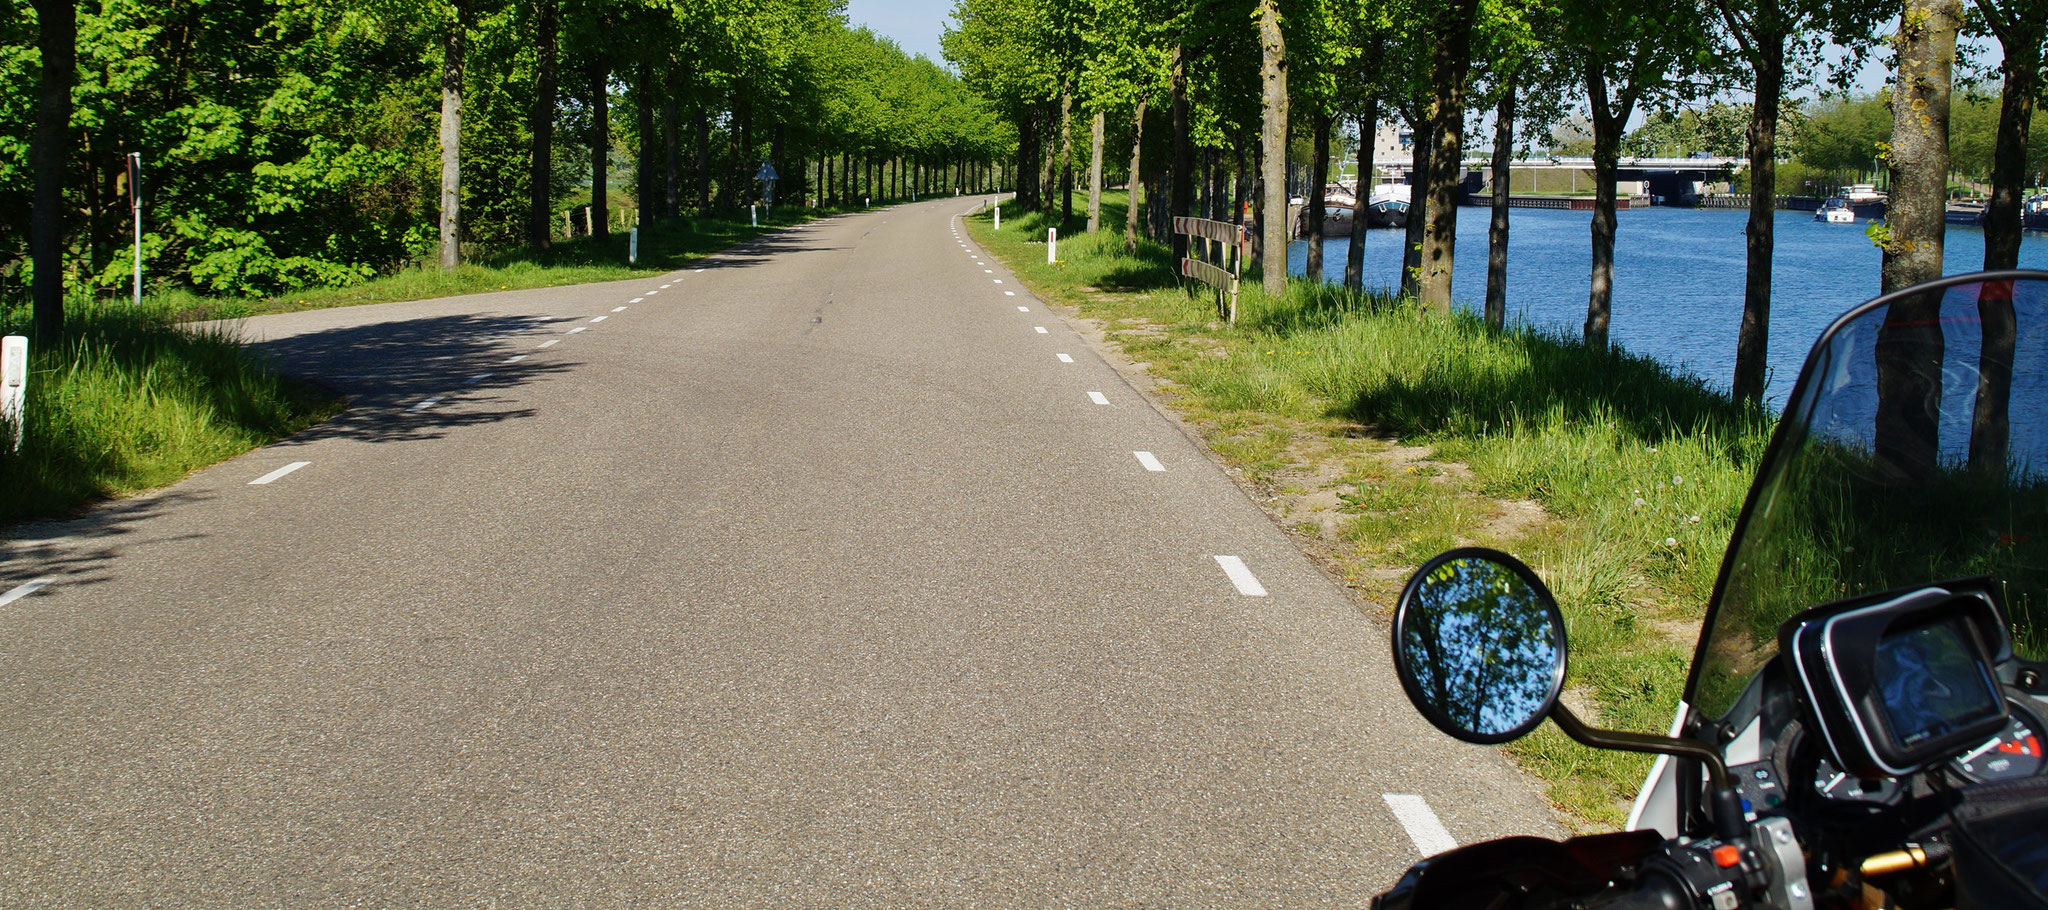 Straße am Kanal entlang